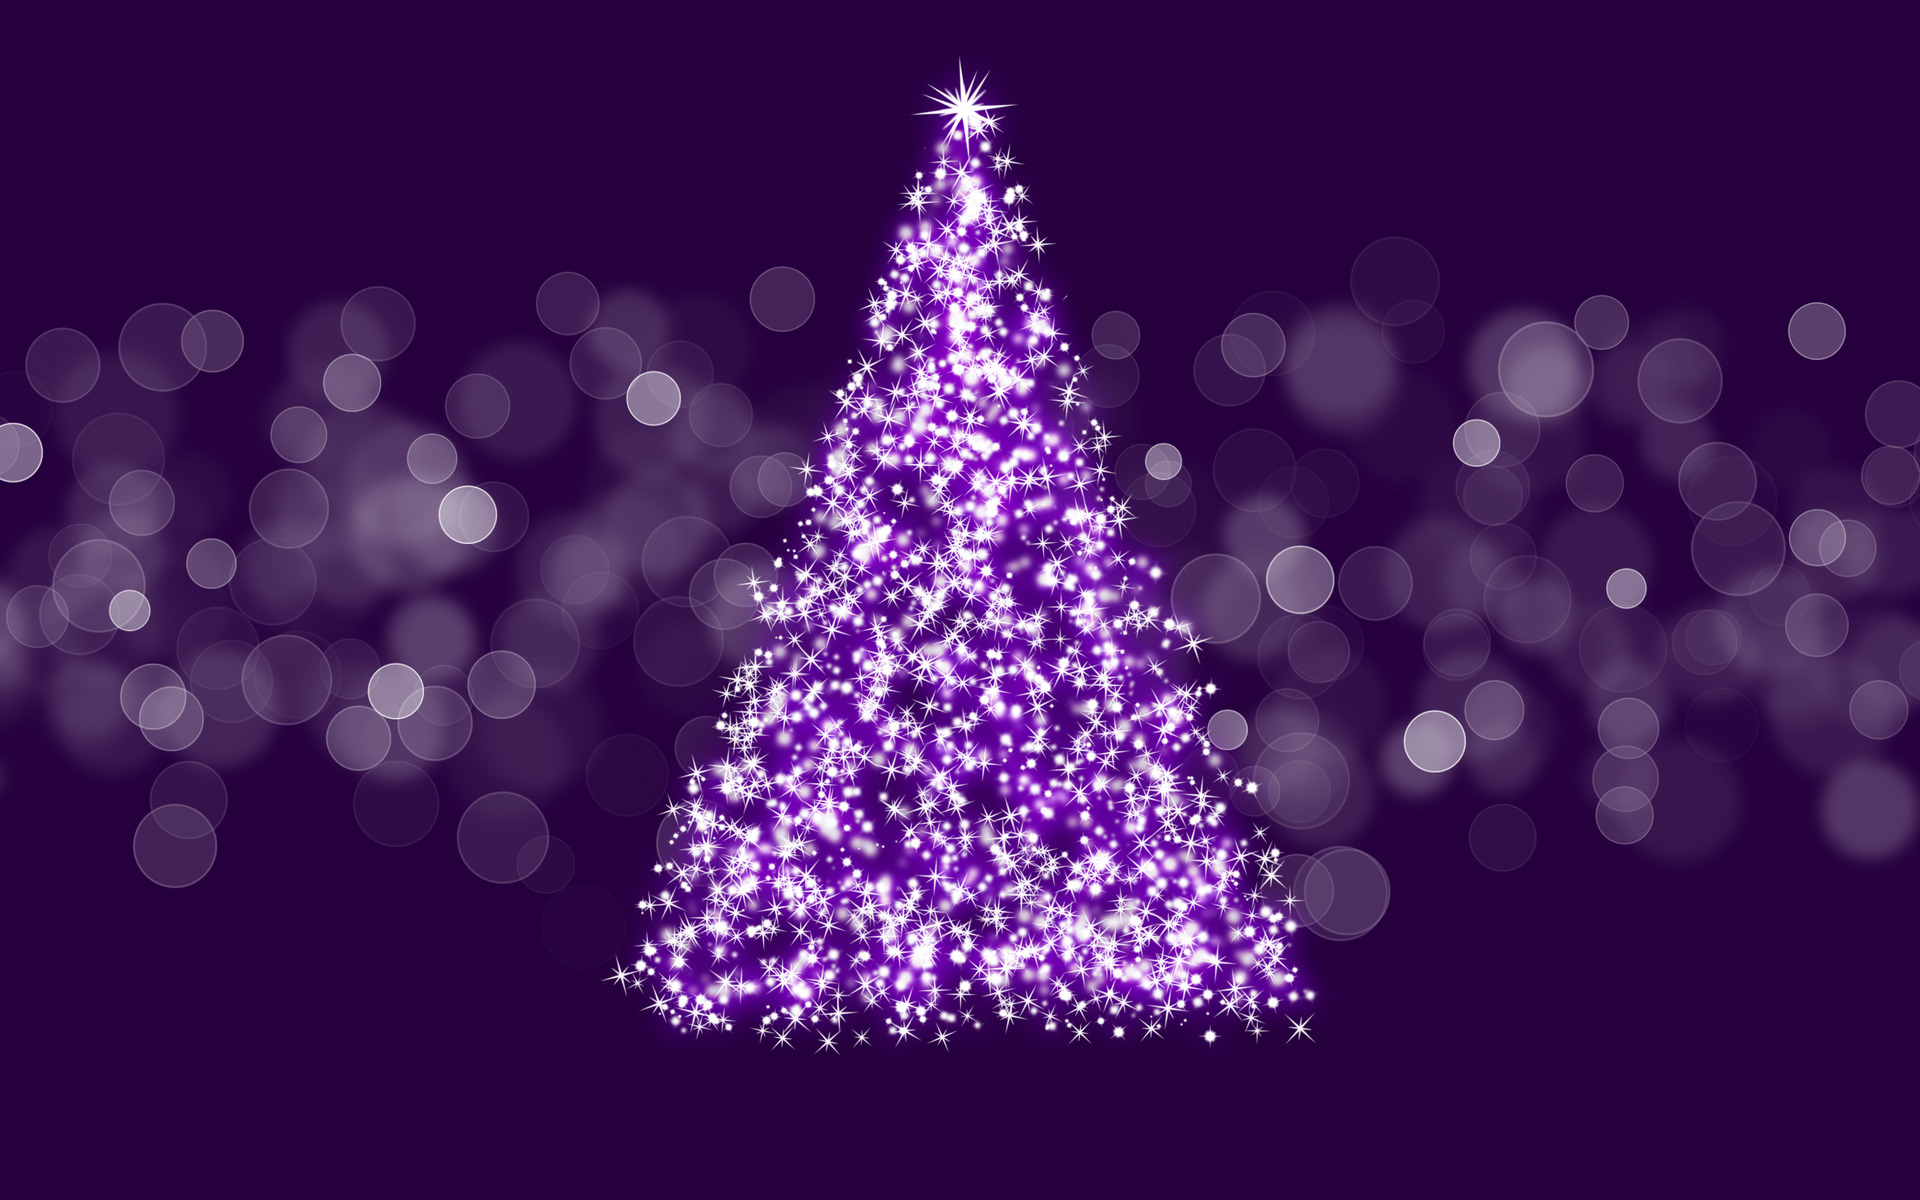 Christmas tree wallpapers high quality download free - Purple christmas desktop wallpaper ...